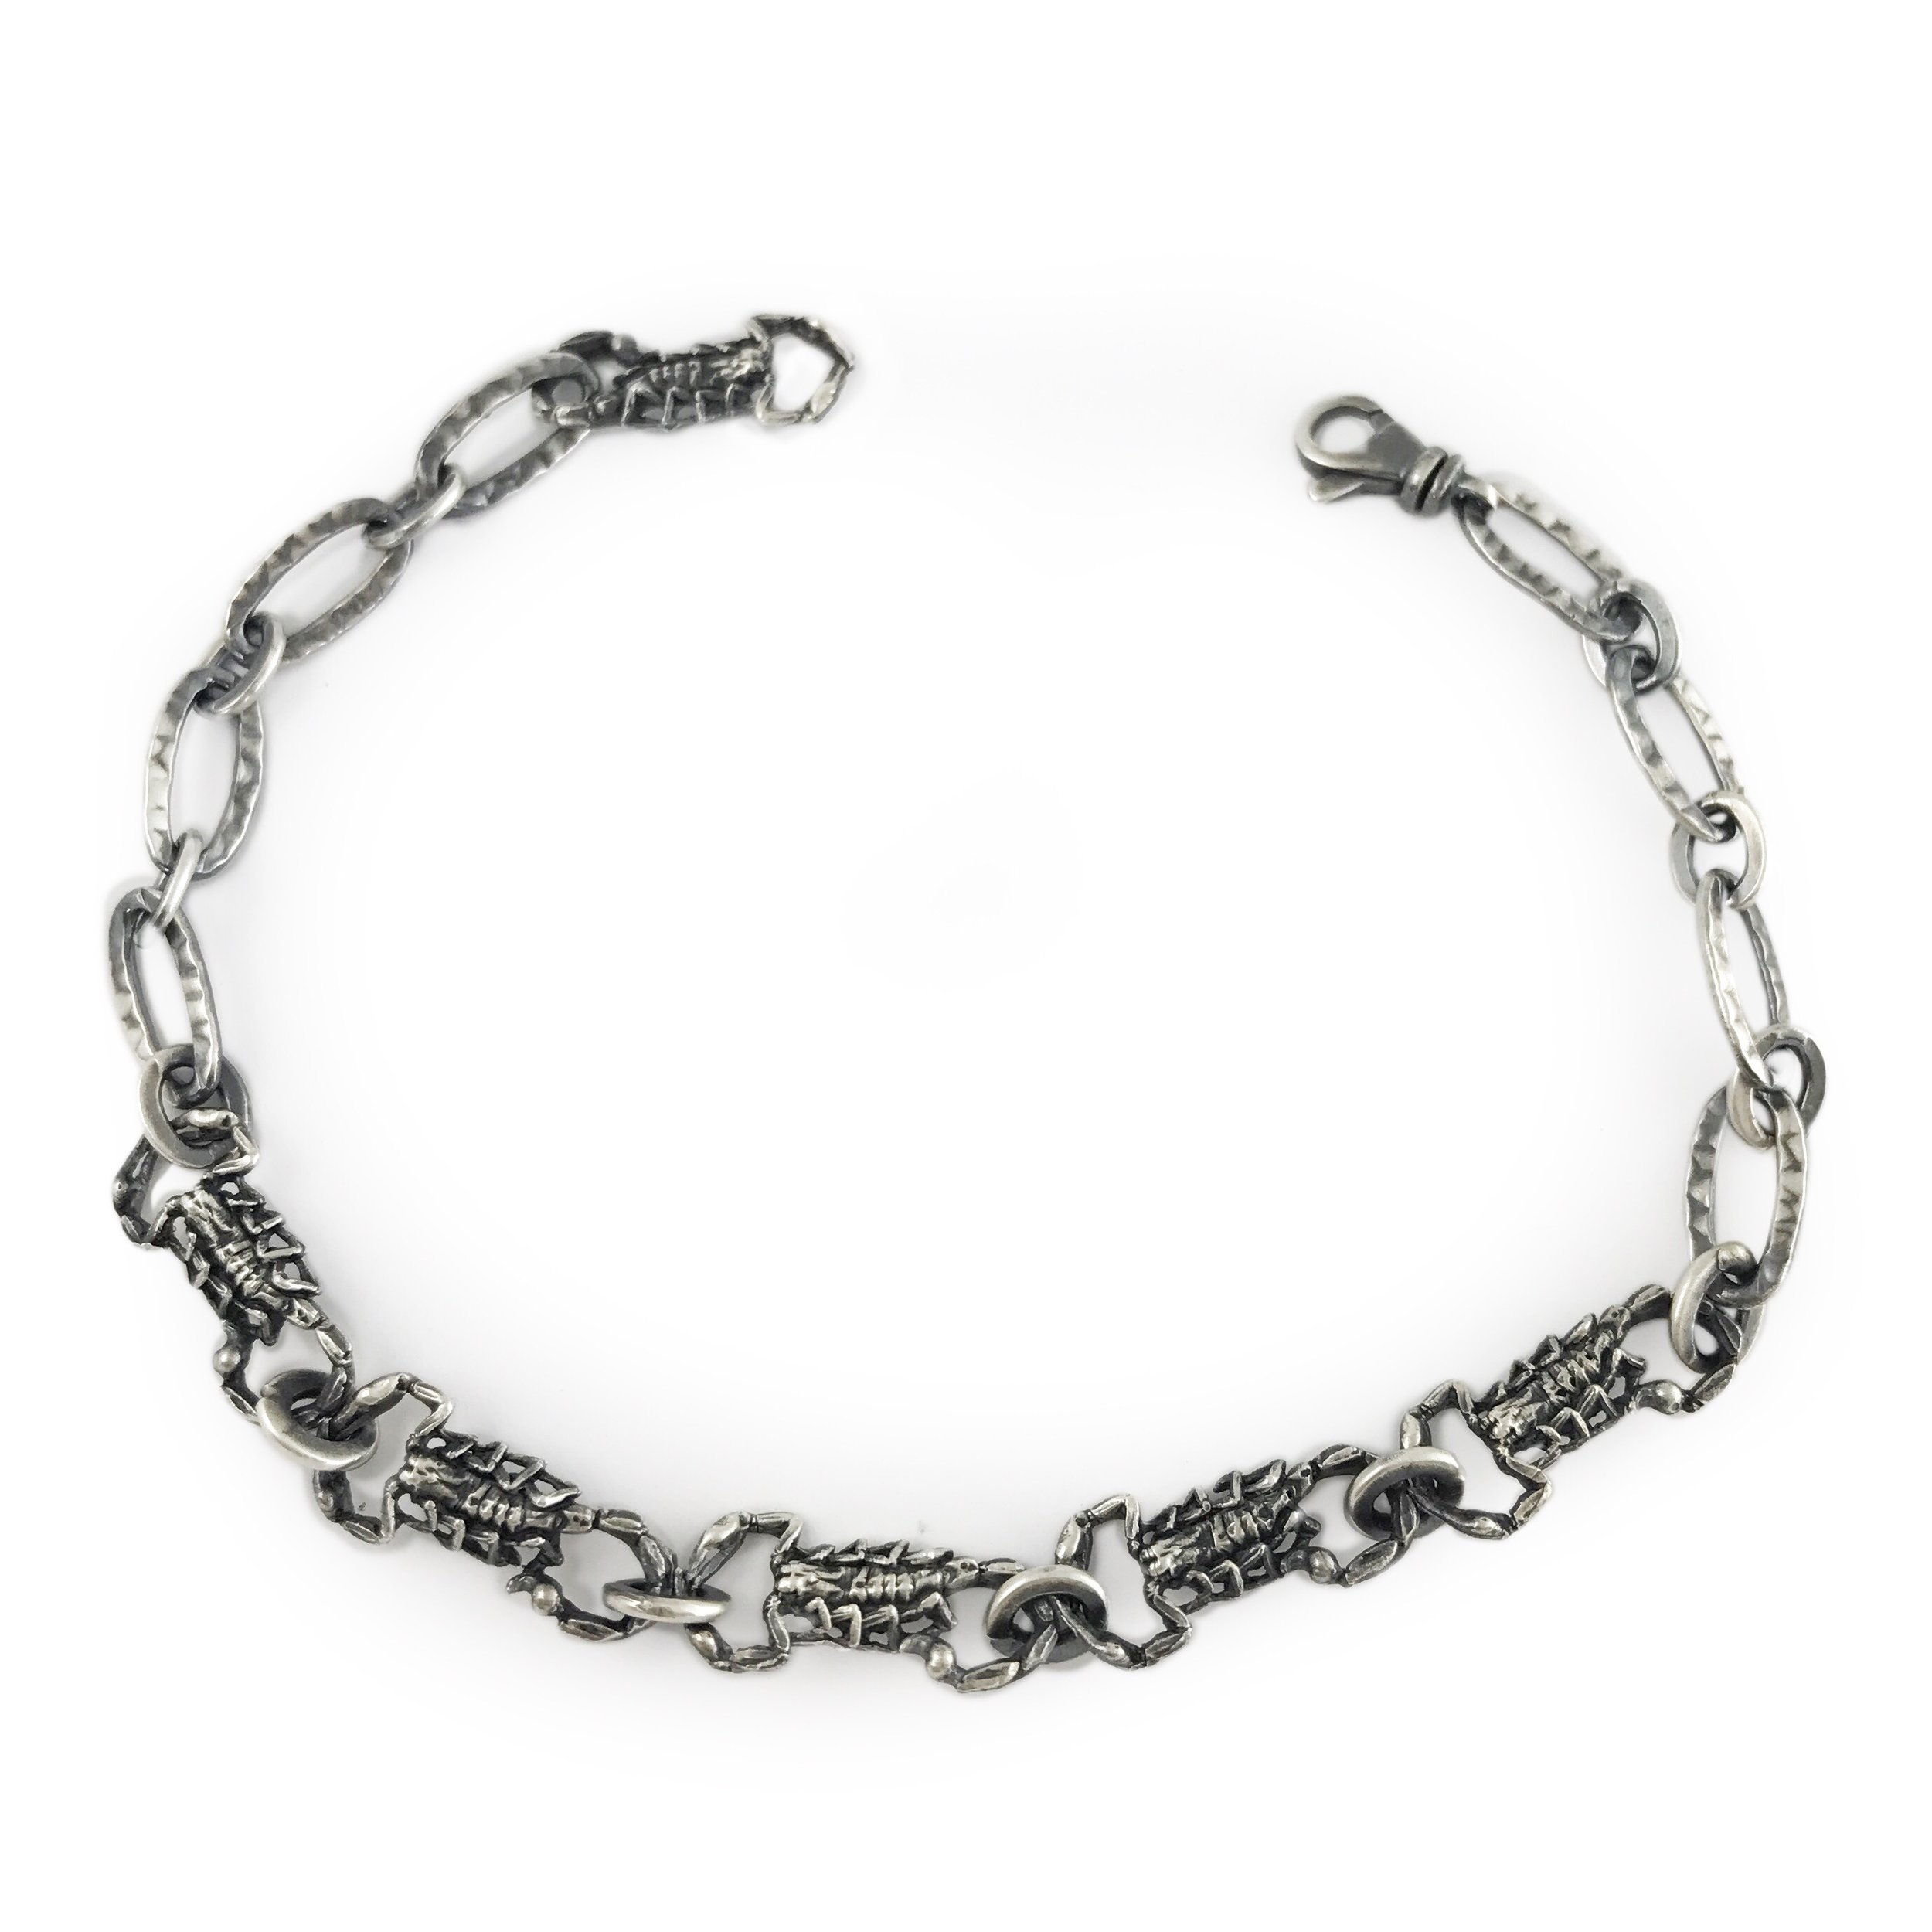 Scorpion chain Bracelet